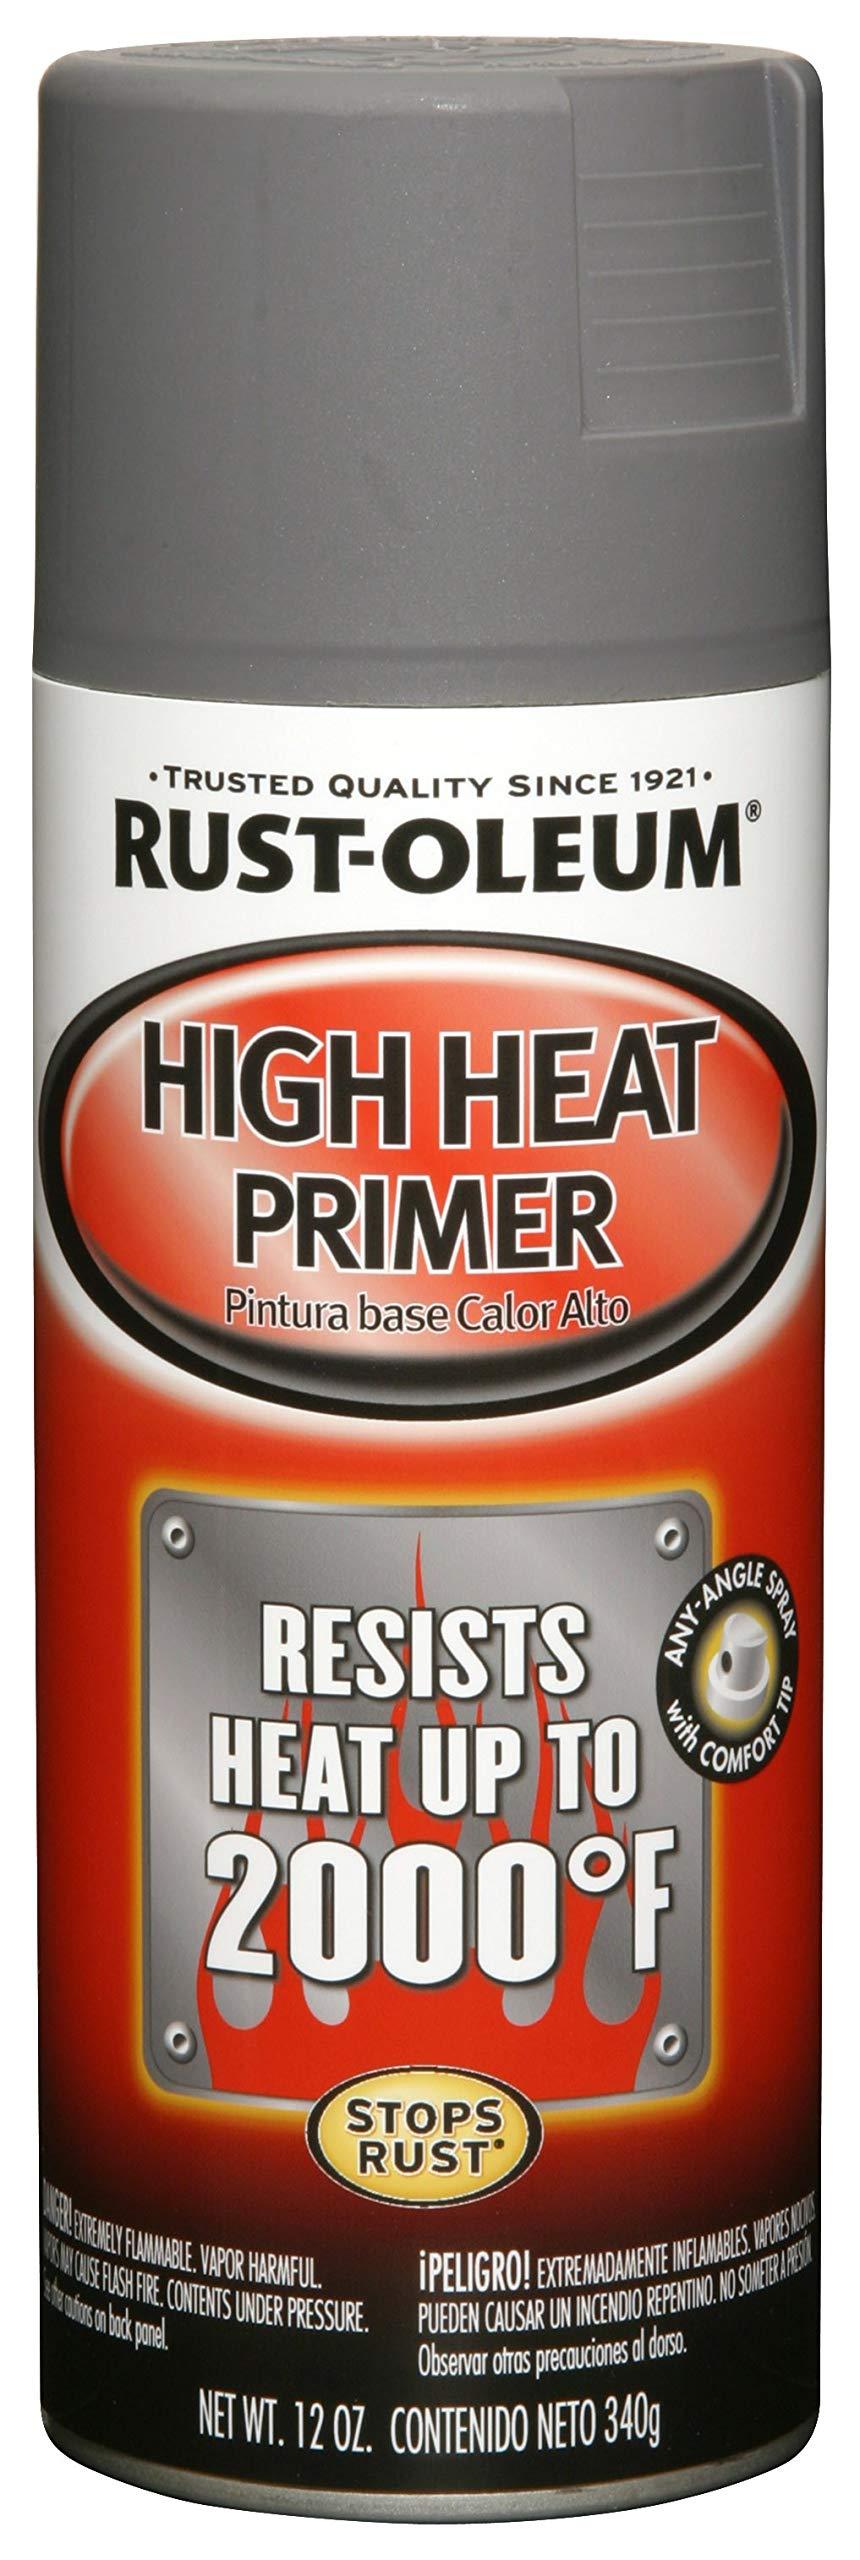 Rust-Oleum 249340 Automotive High Heat Primer Spray Paint, 12 oz, Gray